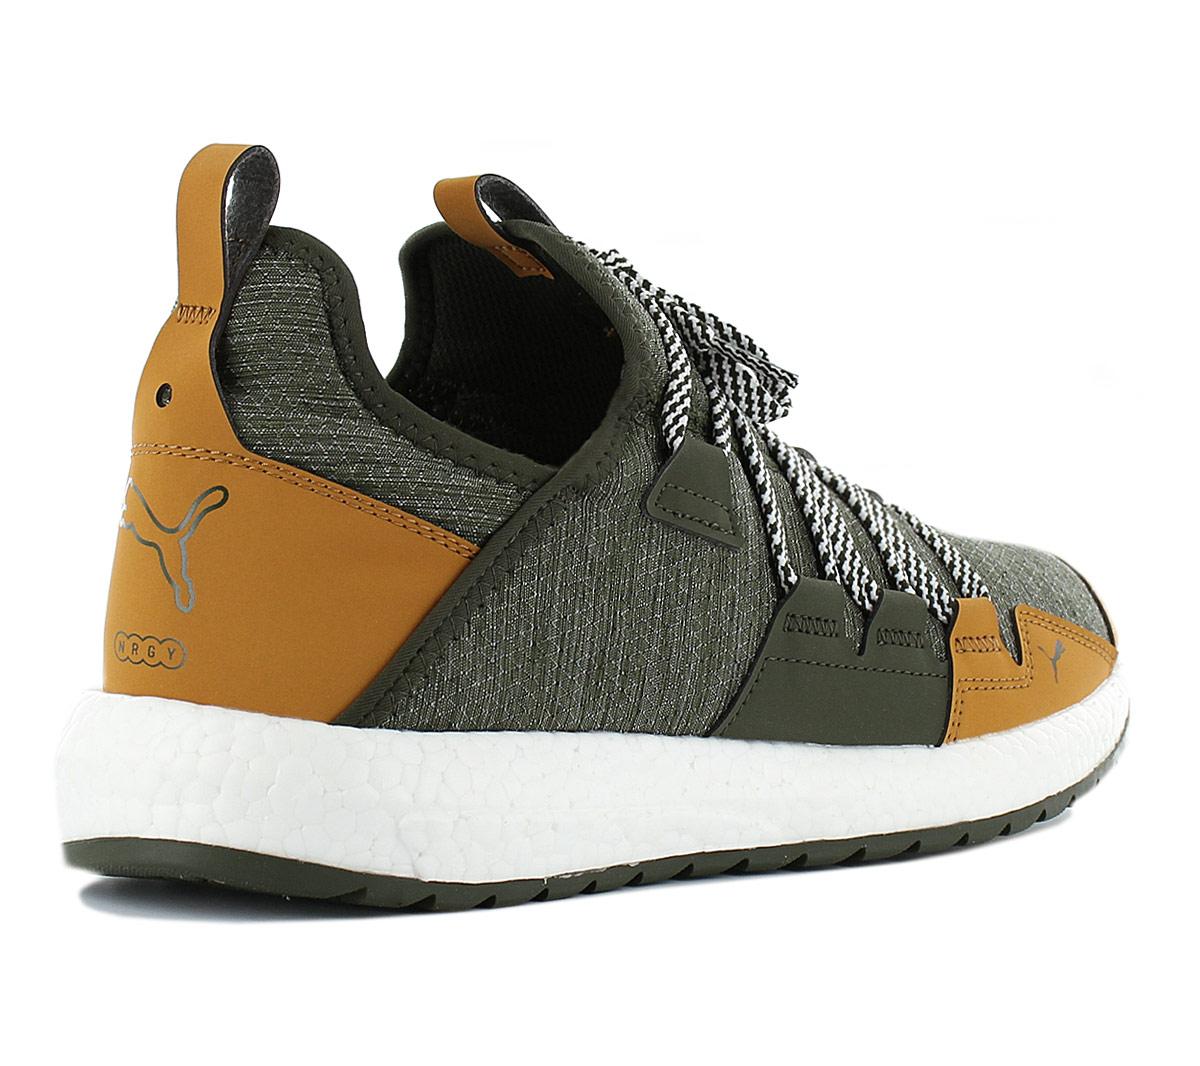 40692245af3d NEW Puma Mega NRGY Trail 191201-01 Men´s Shoes Trainers Sneakers ...